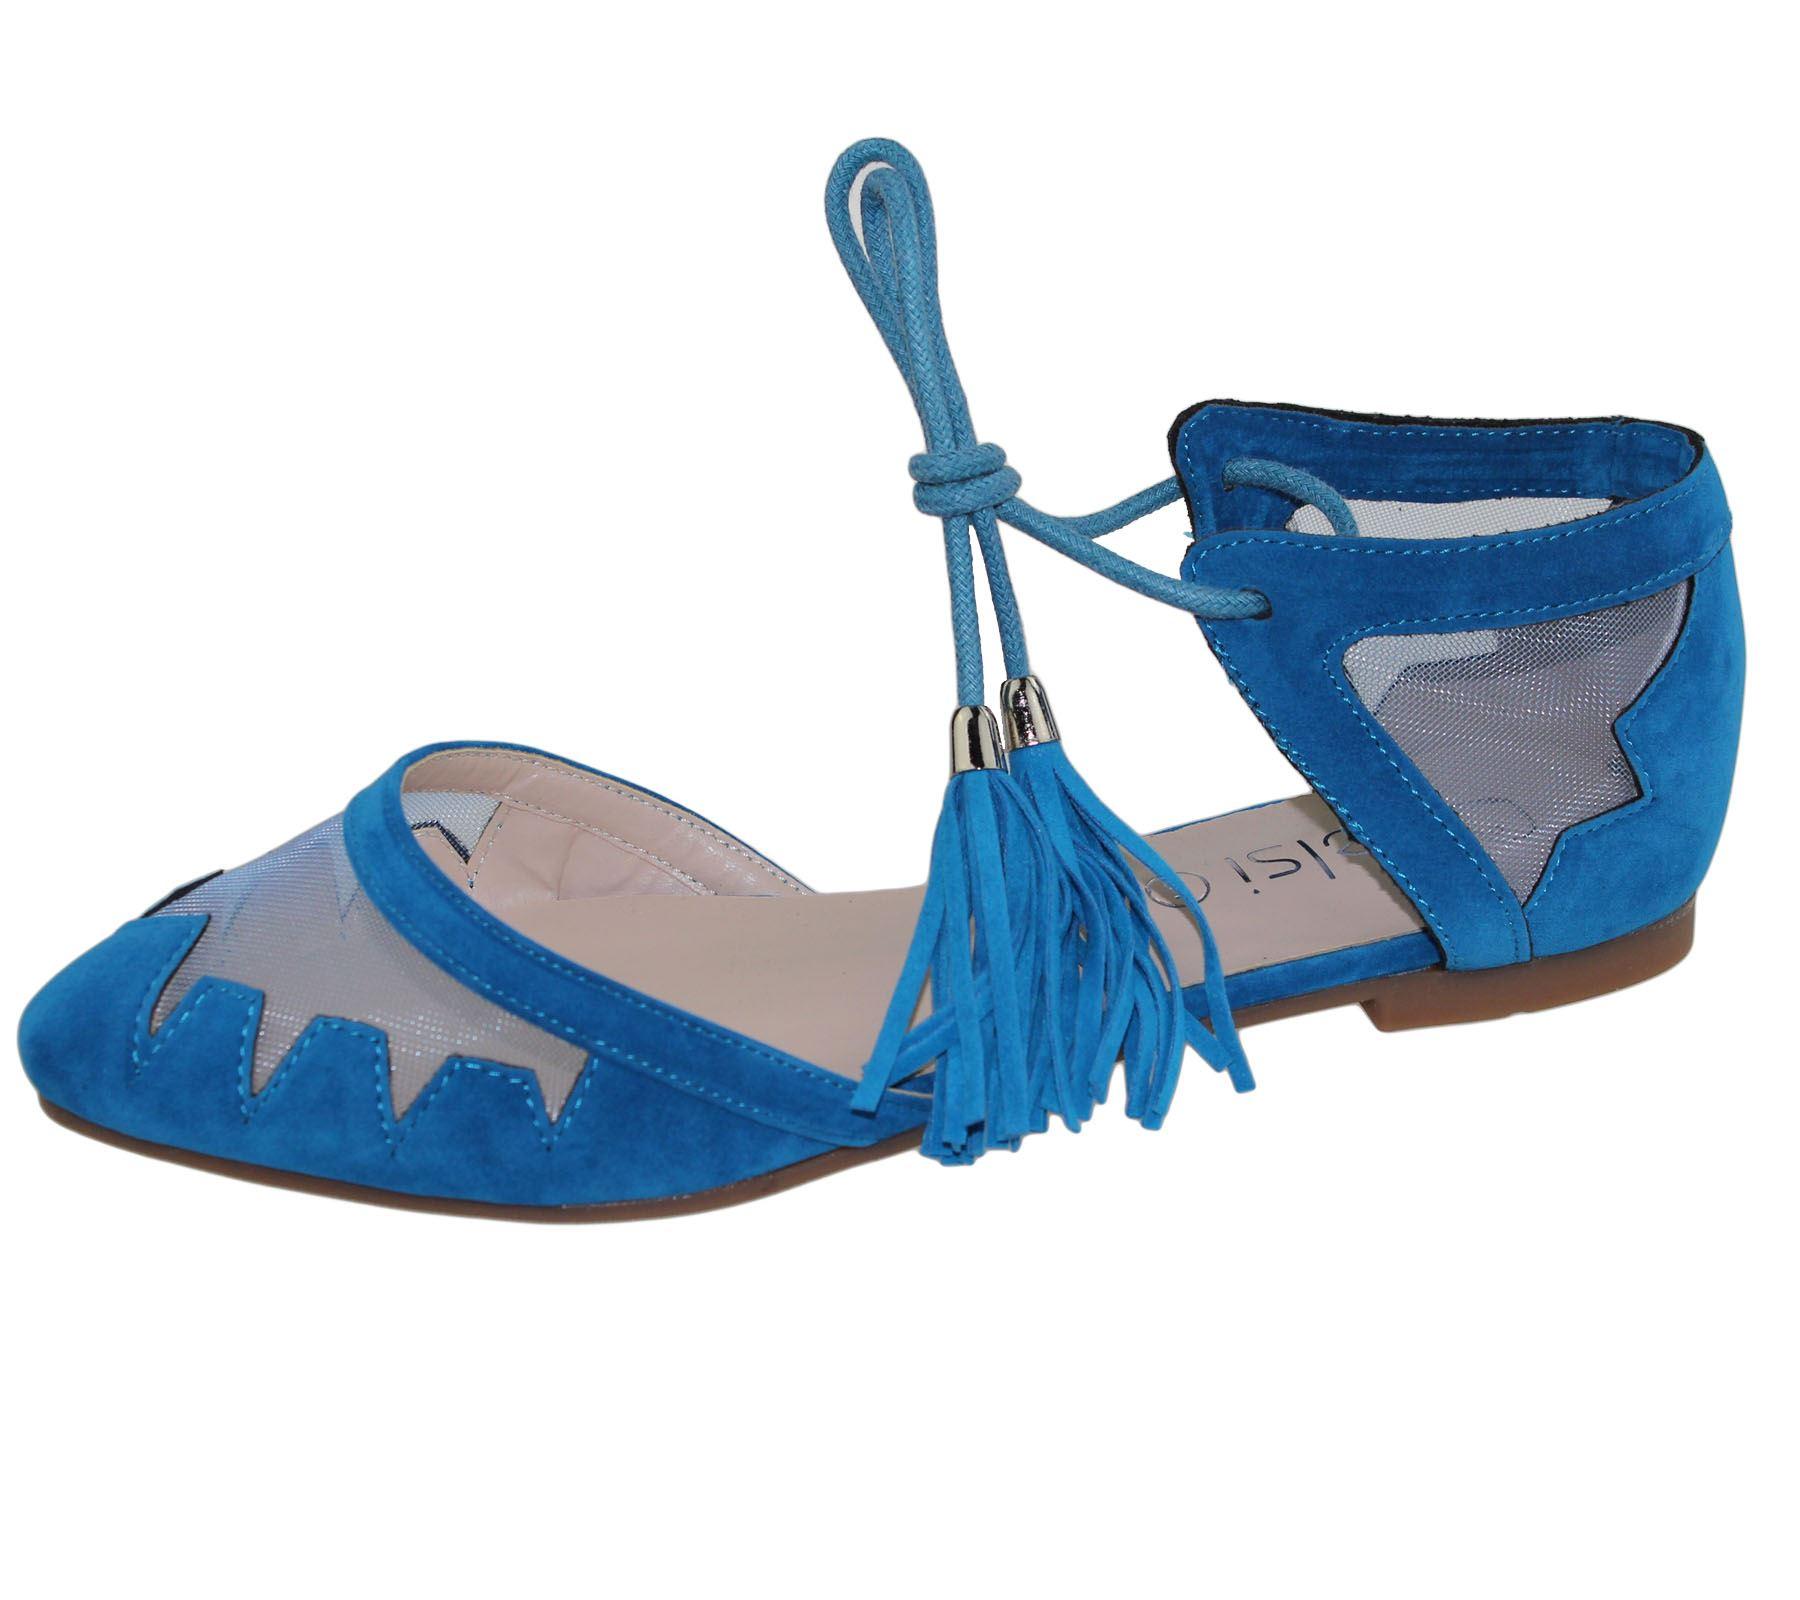 Womens-Flat-Ballerina-Dolly-Pumps-Ballet-Ladies-Summer-Mesh-Tassel-Shoes-Sandals thumbnail 5